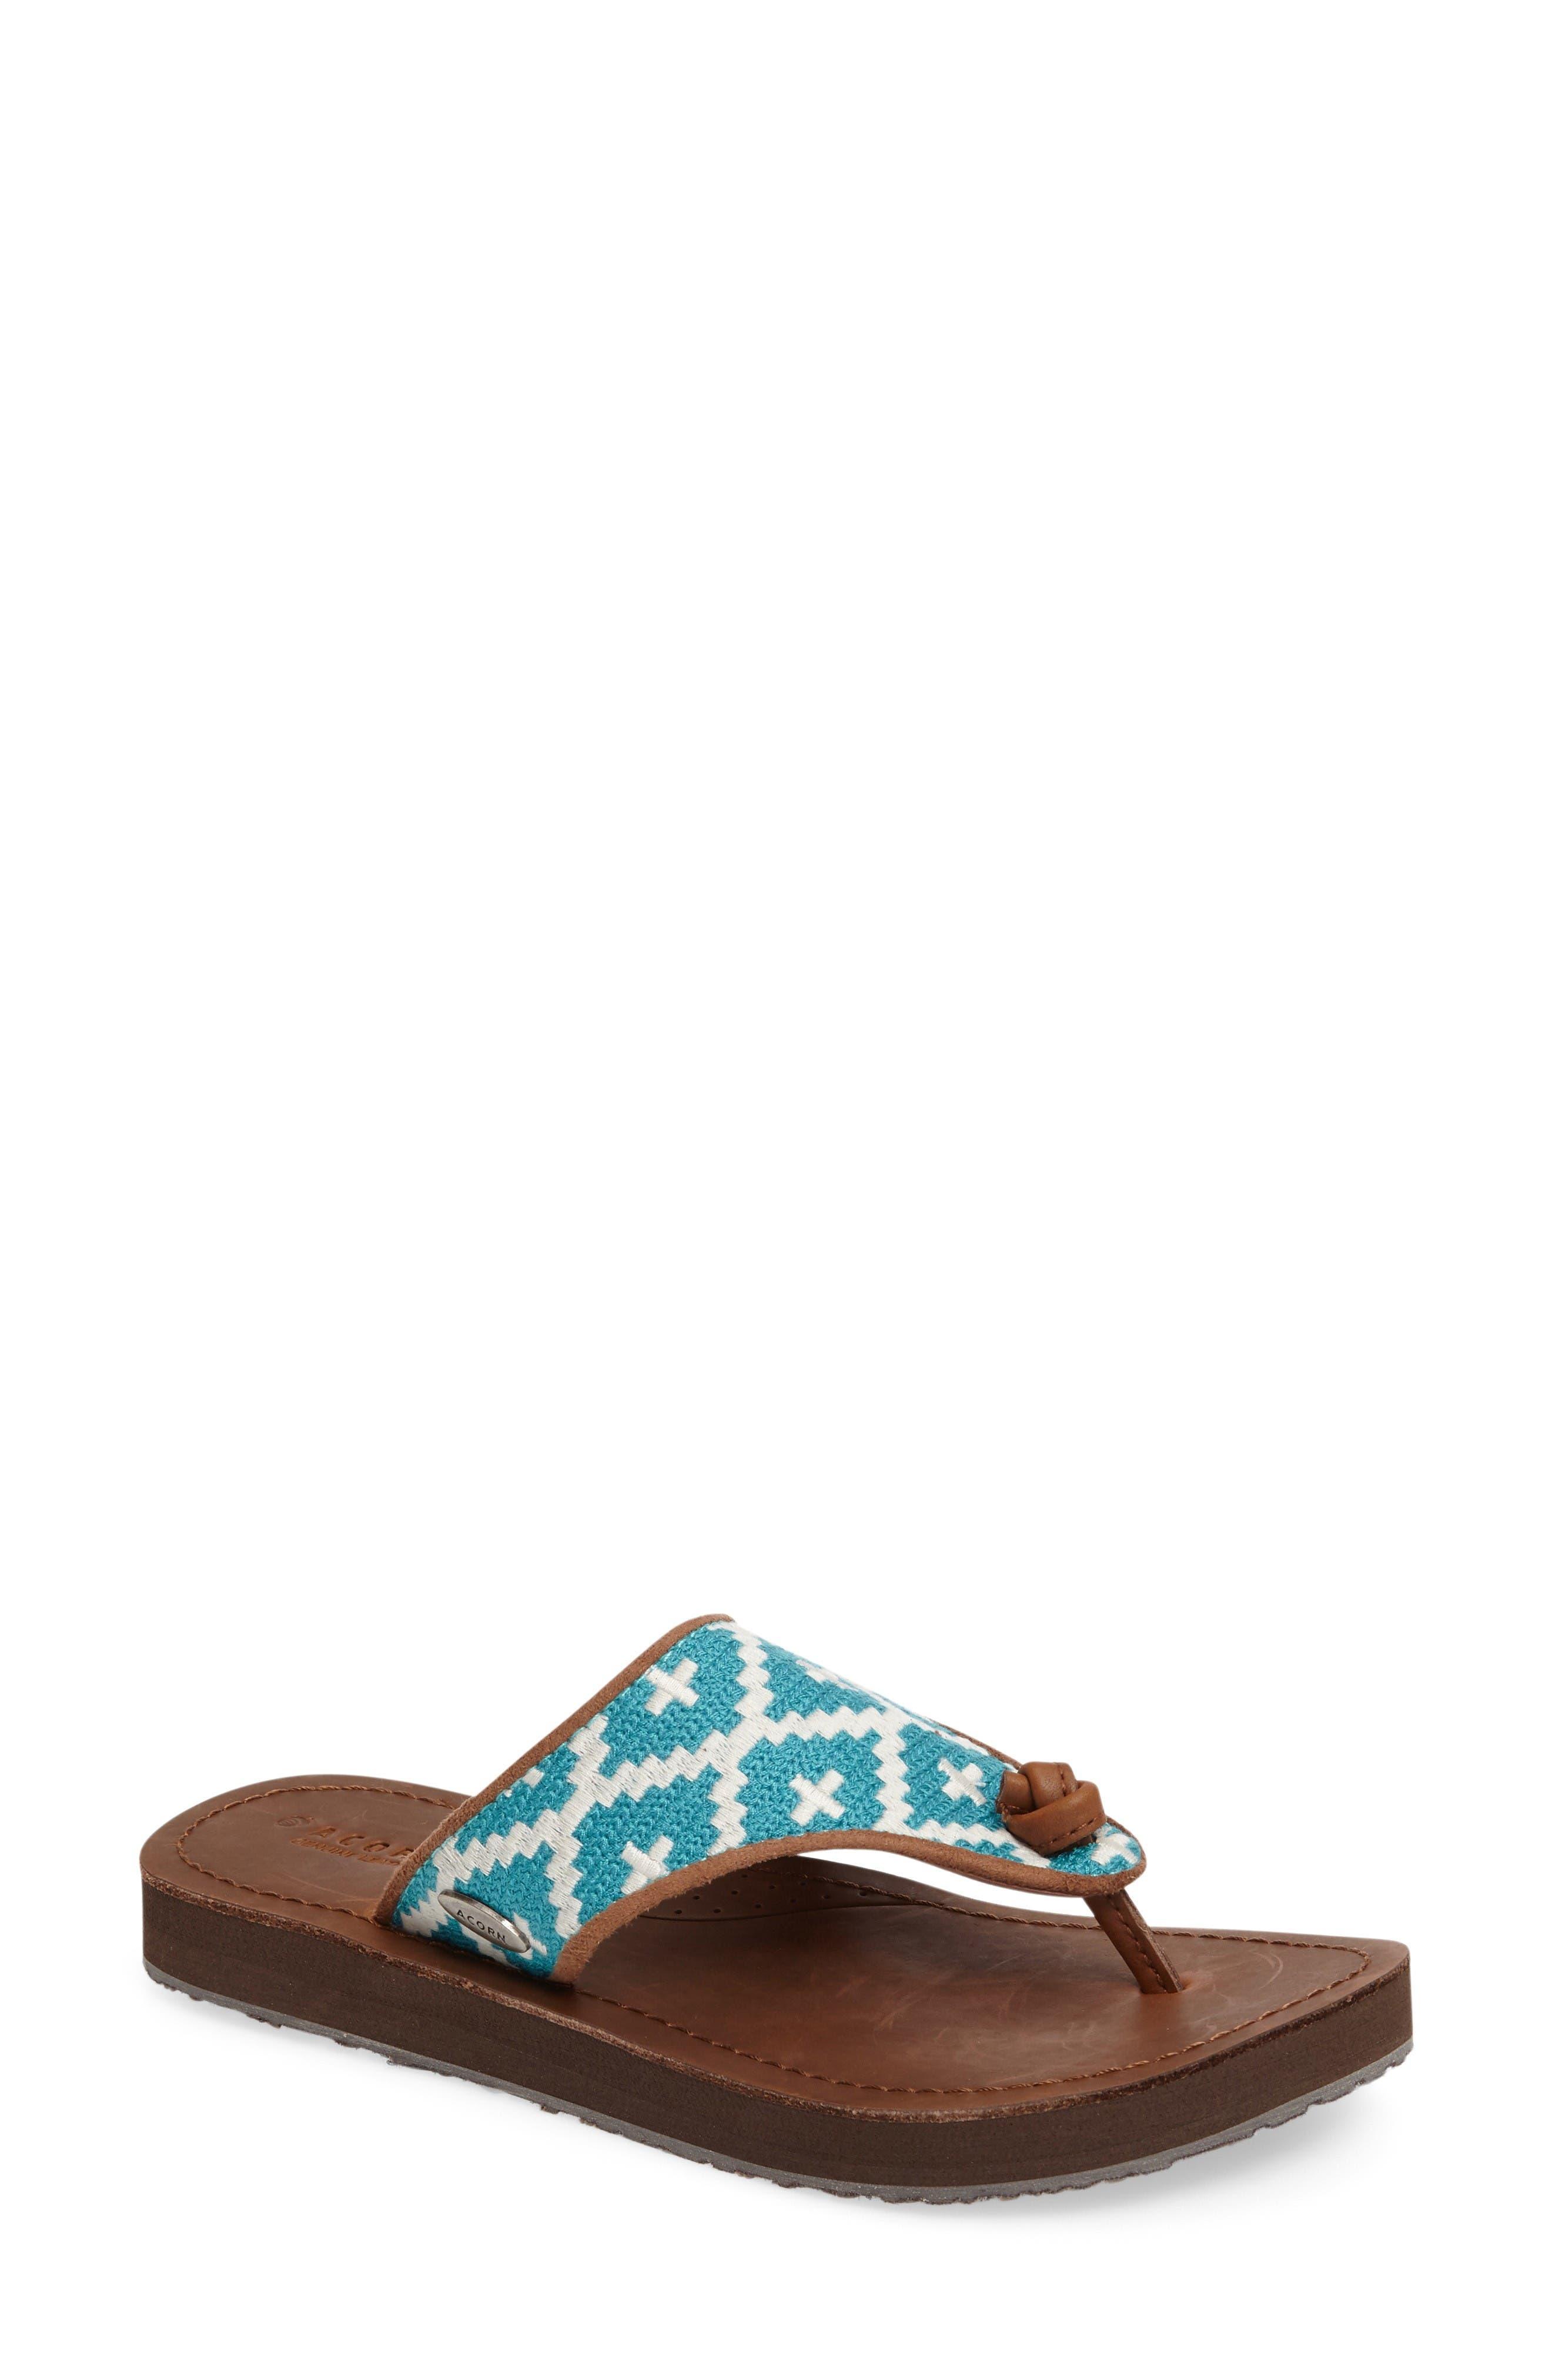 'Artwalk' Flip Flop,                             Main thumbnail 1, color,                             Turquoise/ Cream Fabric